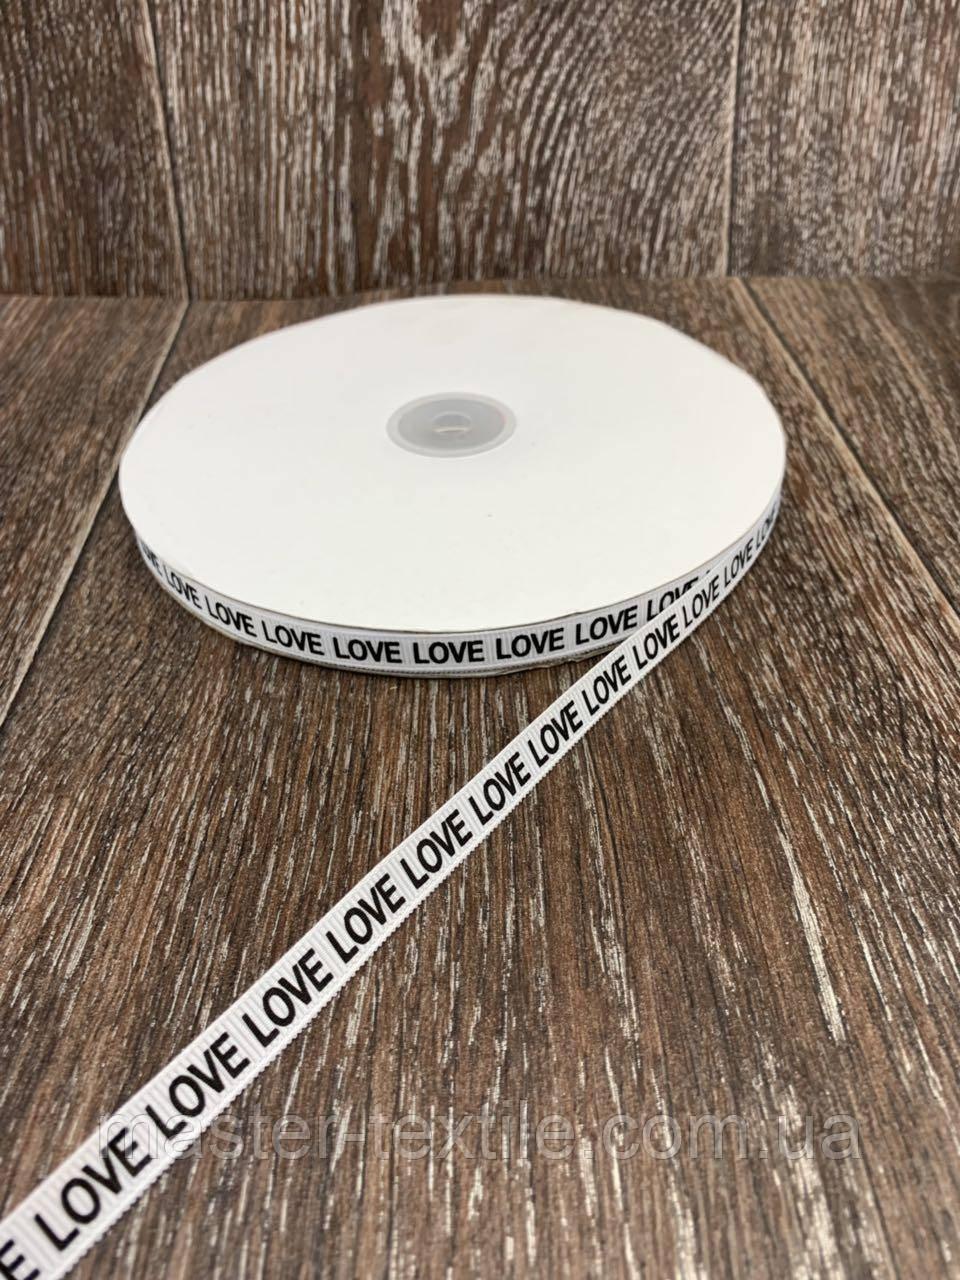 Лента респ с надписью LOVE белая 100 ярд, ширина 1 см